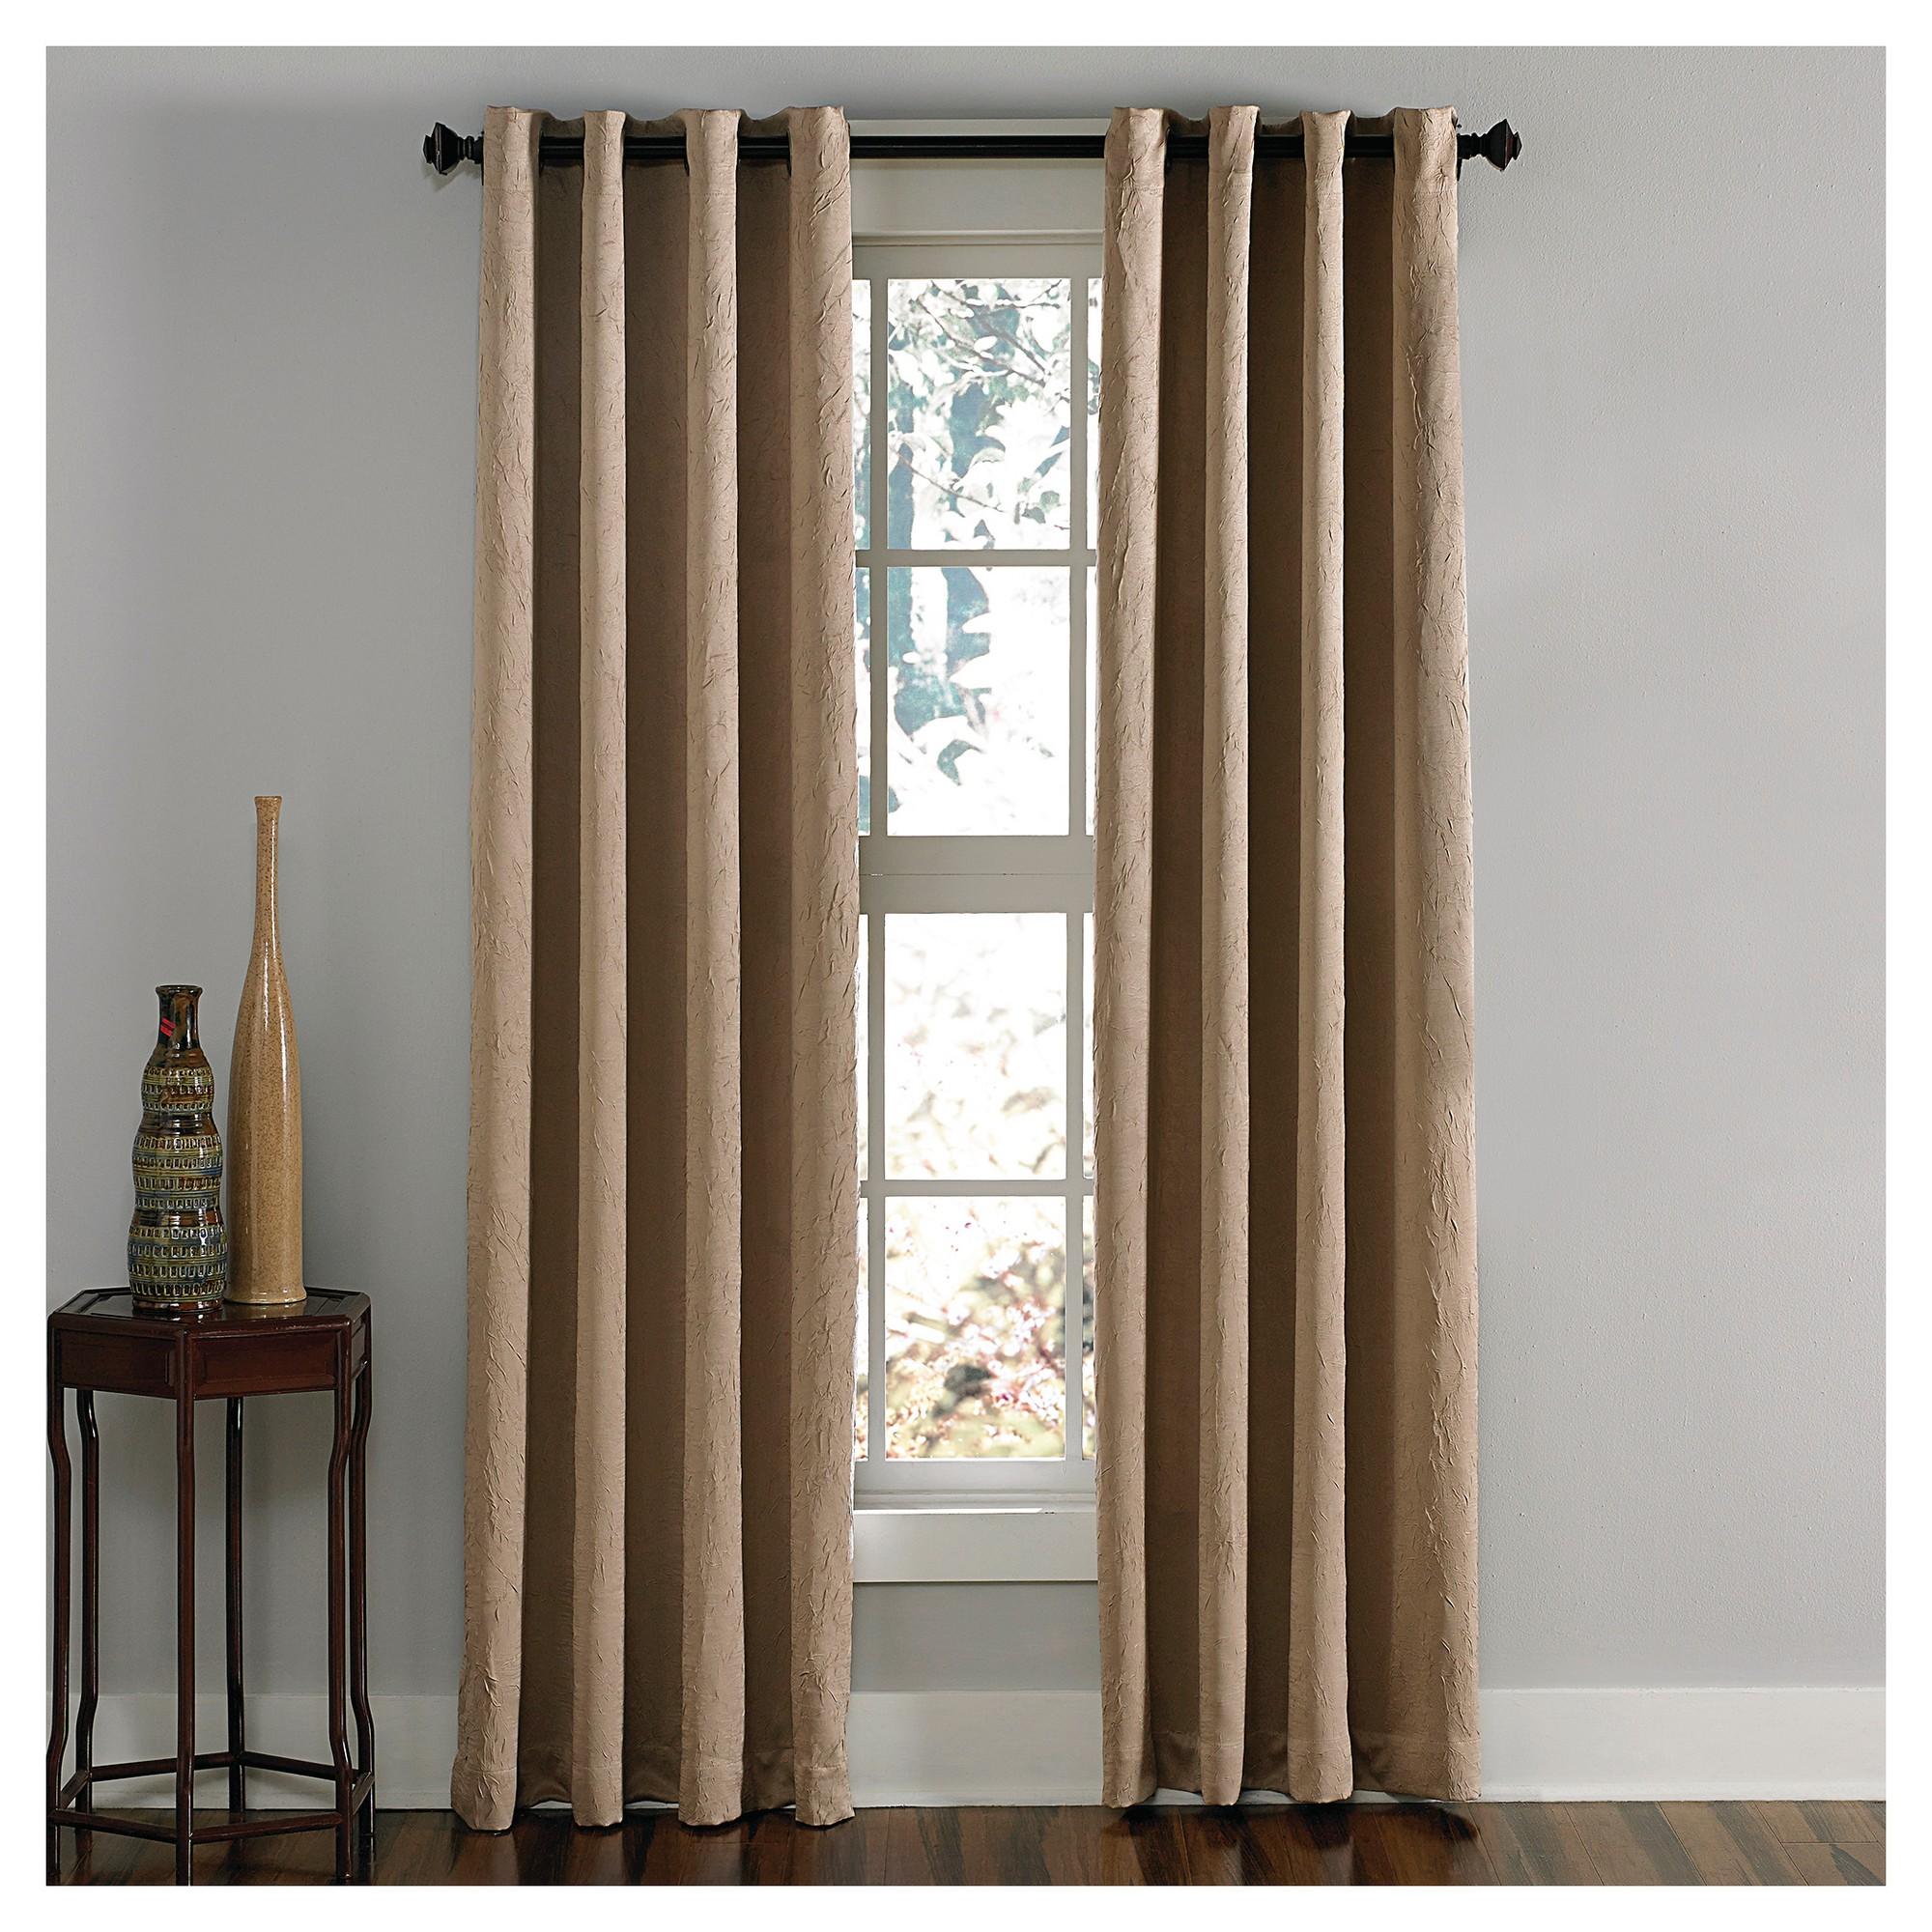 Curtainworks Lenox Room Darkening Curtain Panel Taupe 132